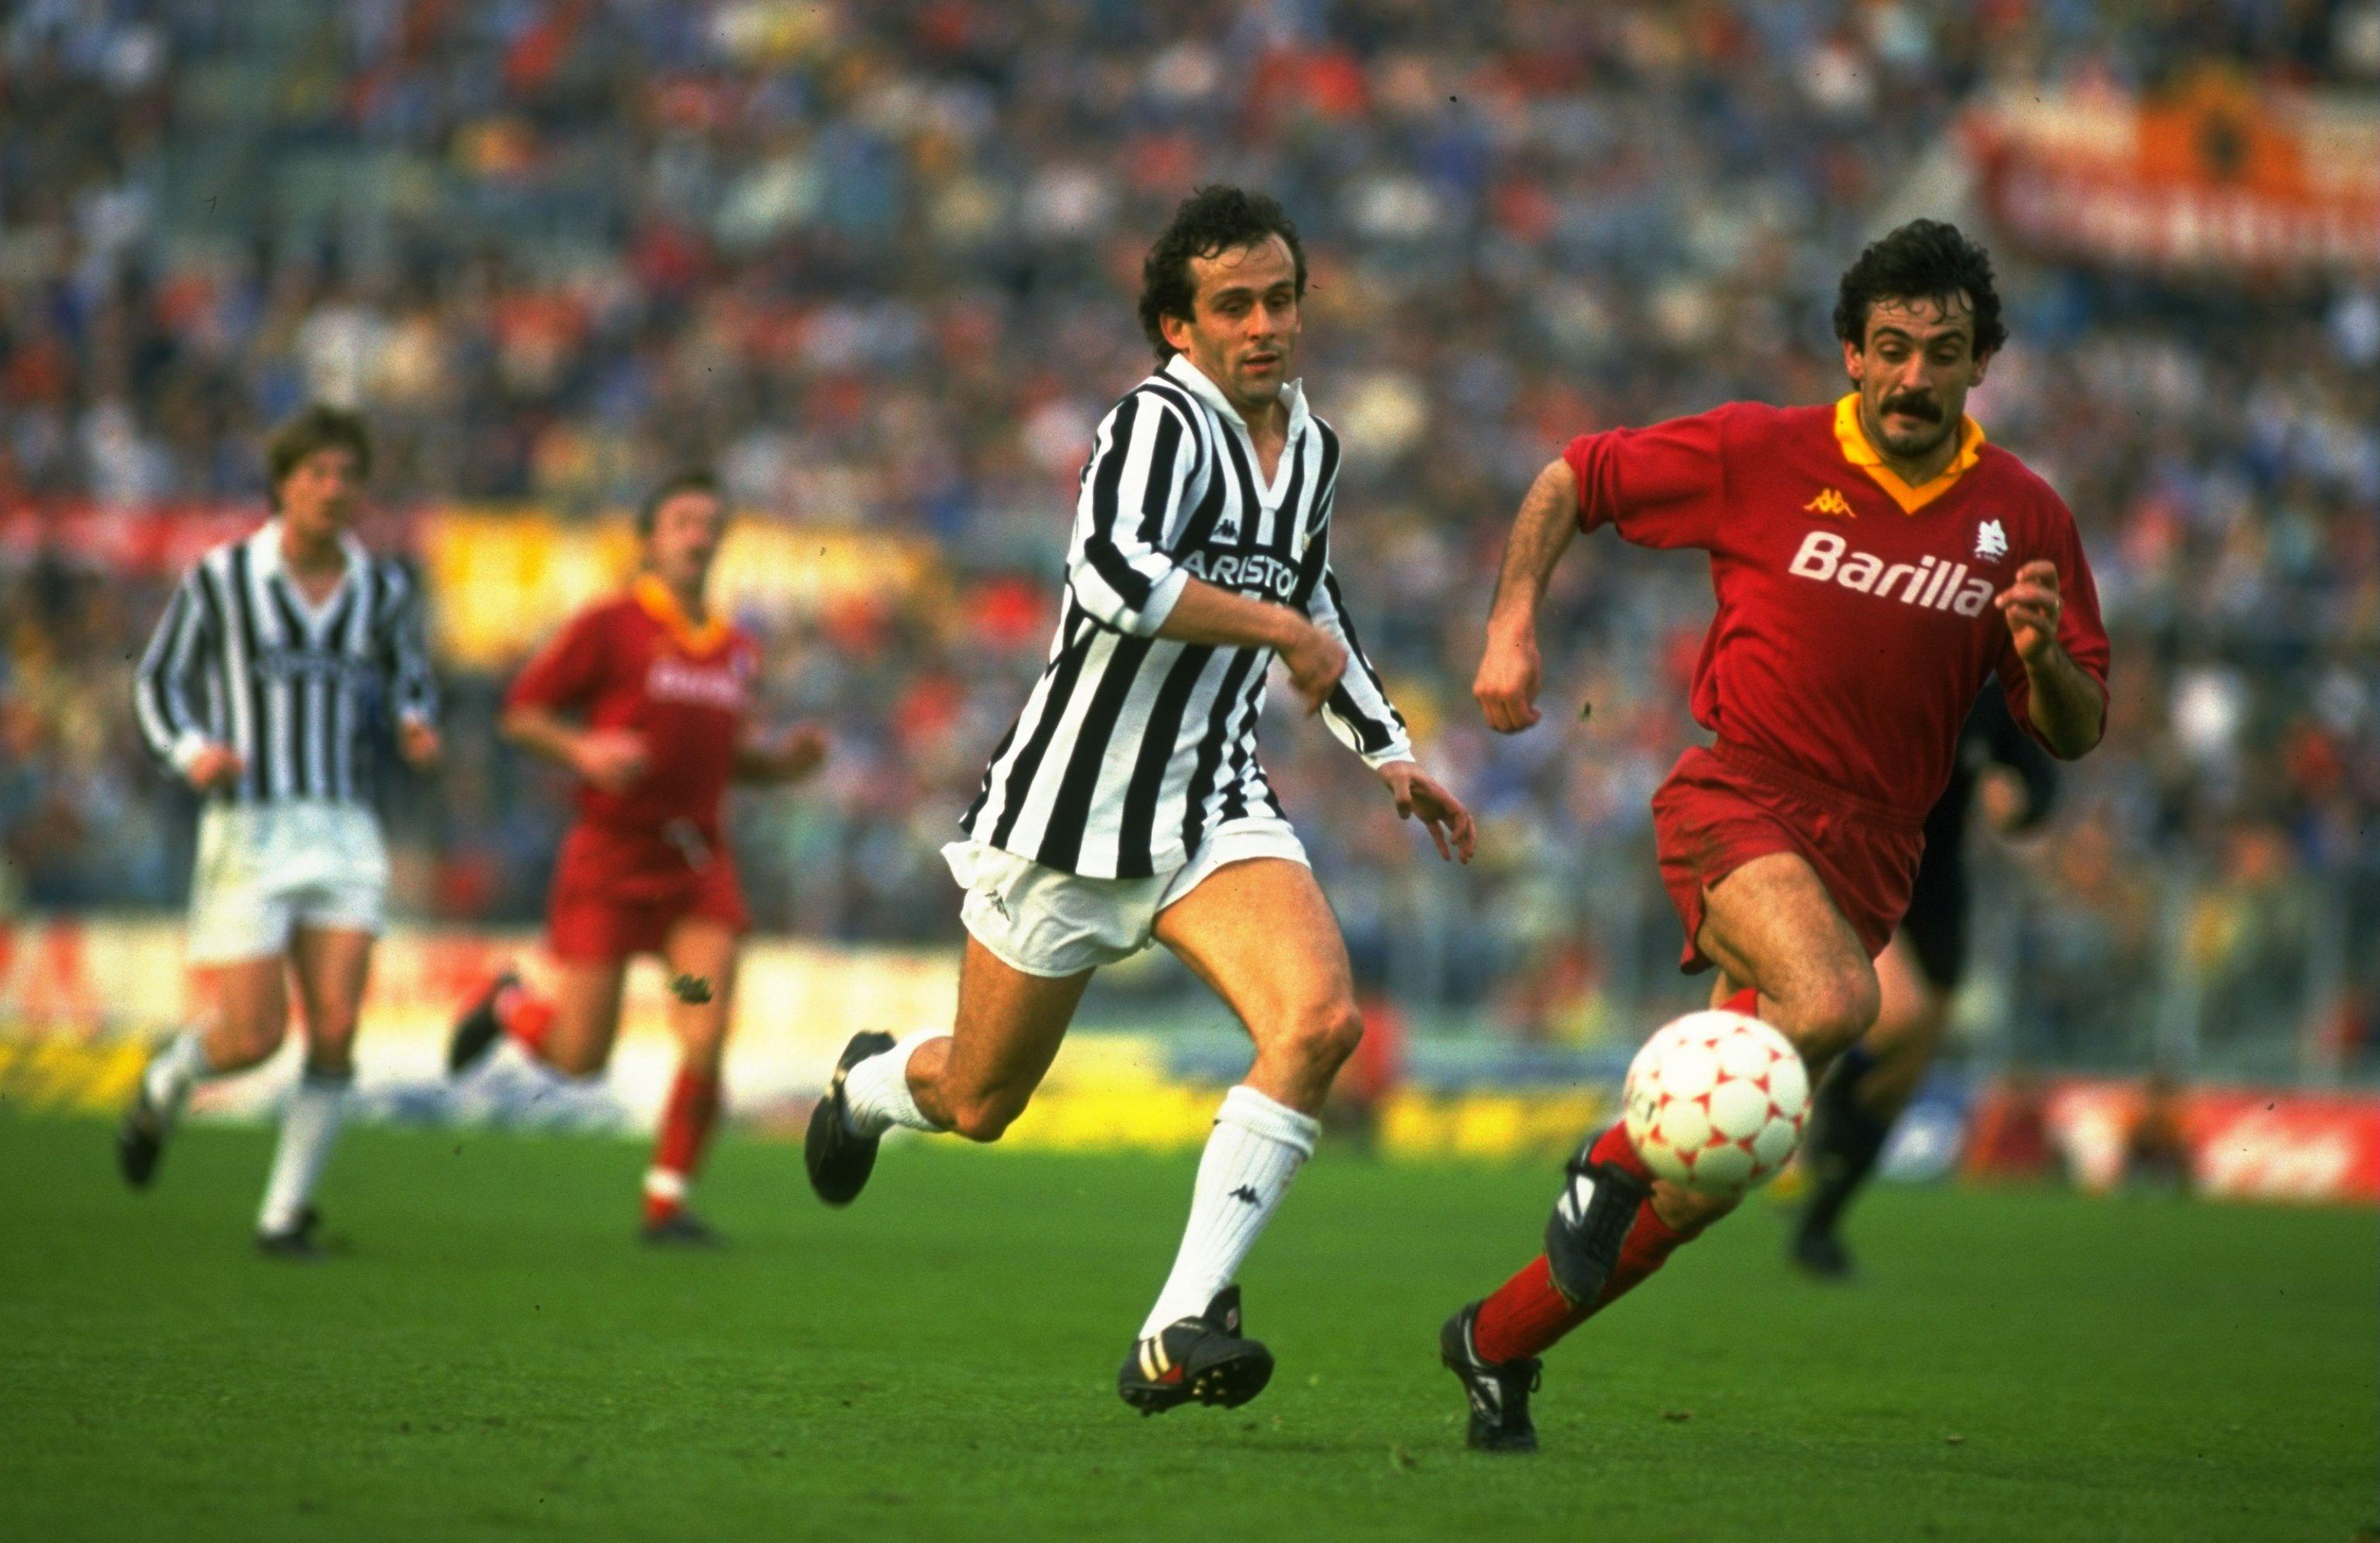 Undated:  Michel Platini (left) of Juventus chases Emidio Oddi of Roma  during an Italian League match at the Olympic Stadium in Rome. Roma won the match 3-0. \ Mandatory Credit: Allsport UK /Allsport